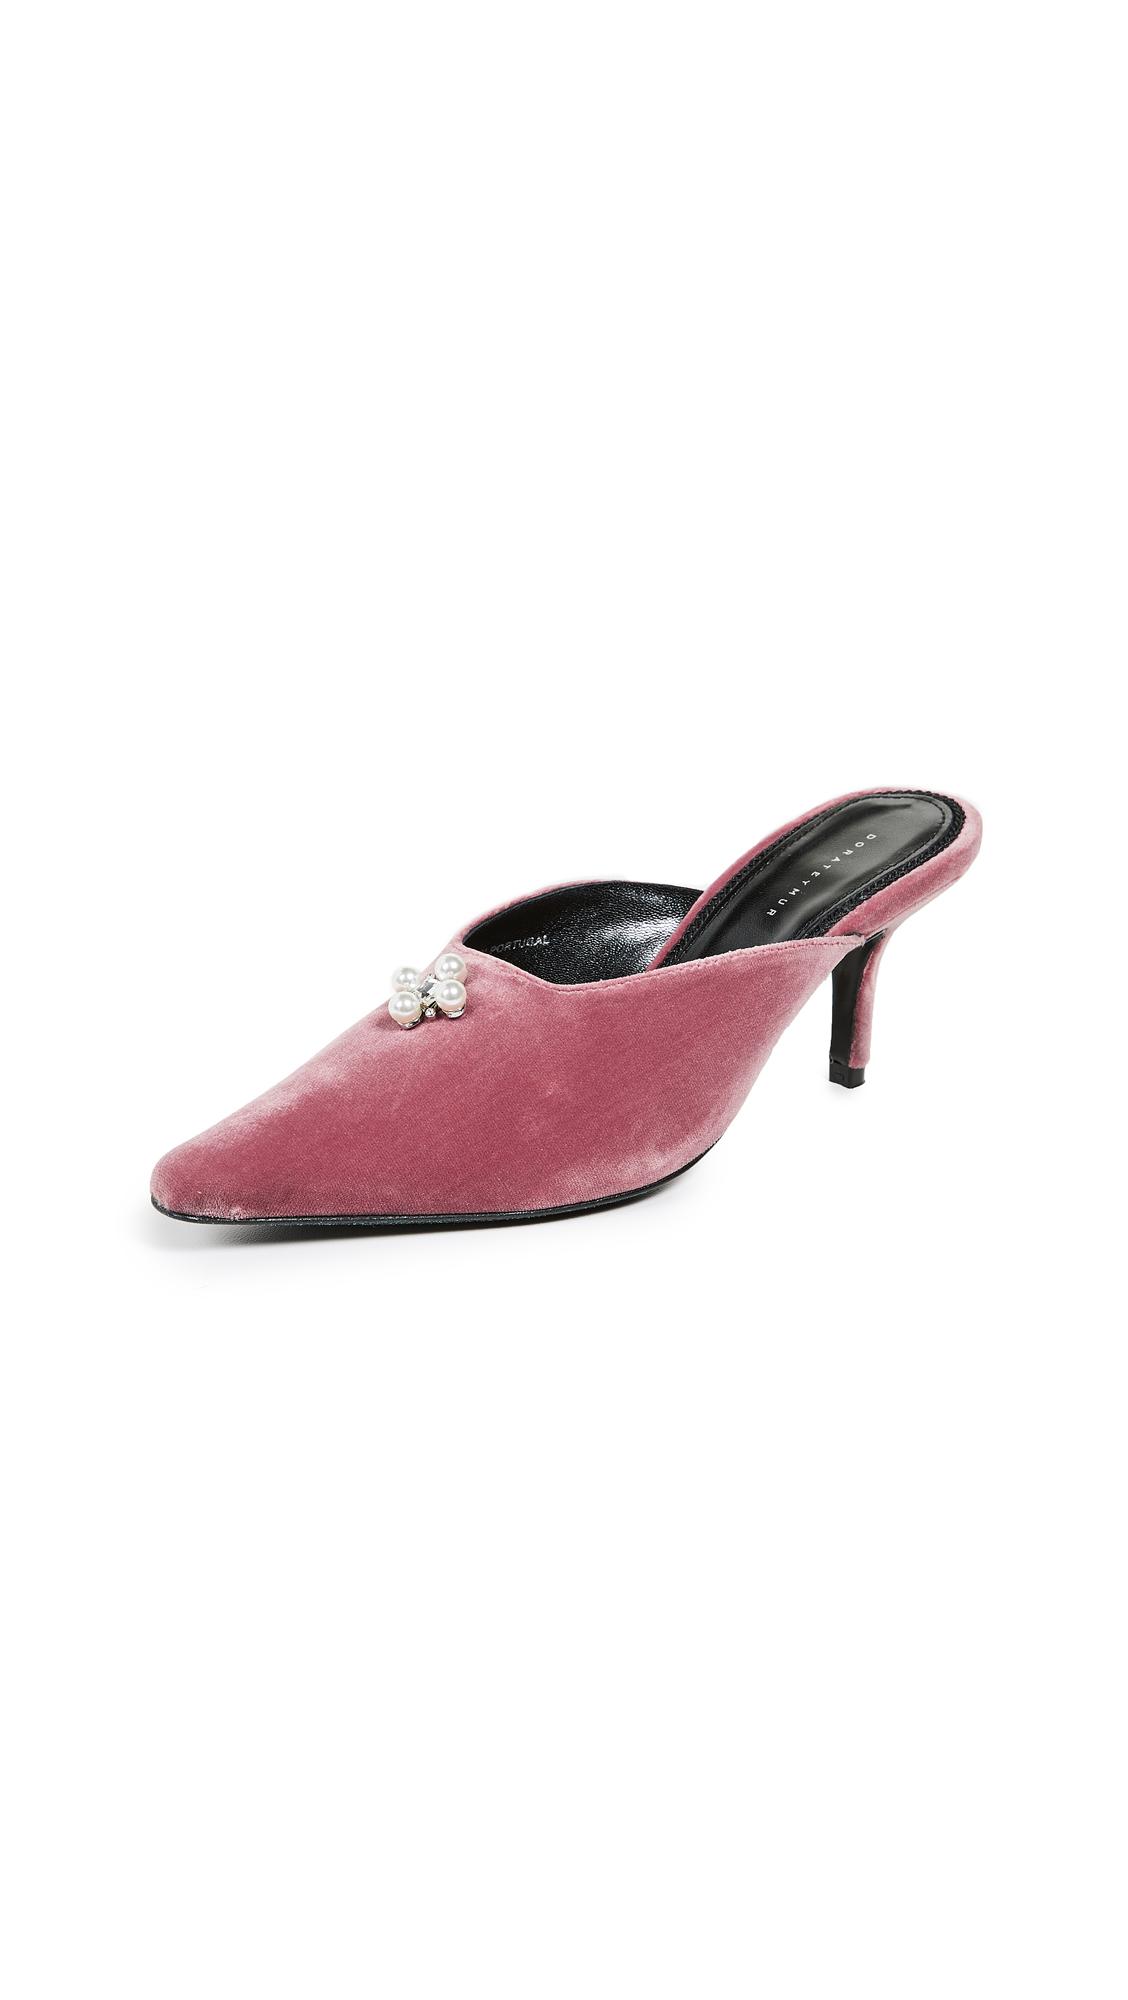 Dorateymur Groupie Ballroom Mules - Pink